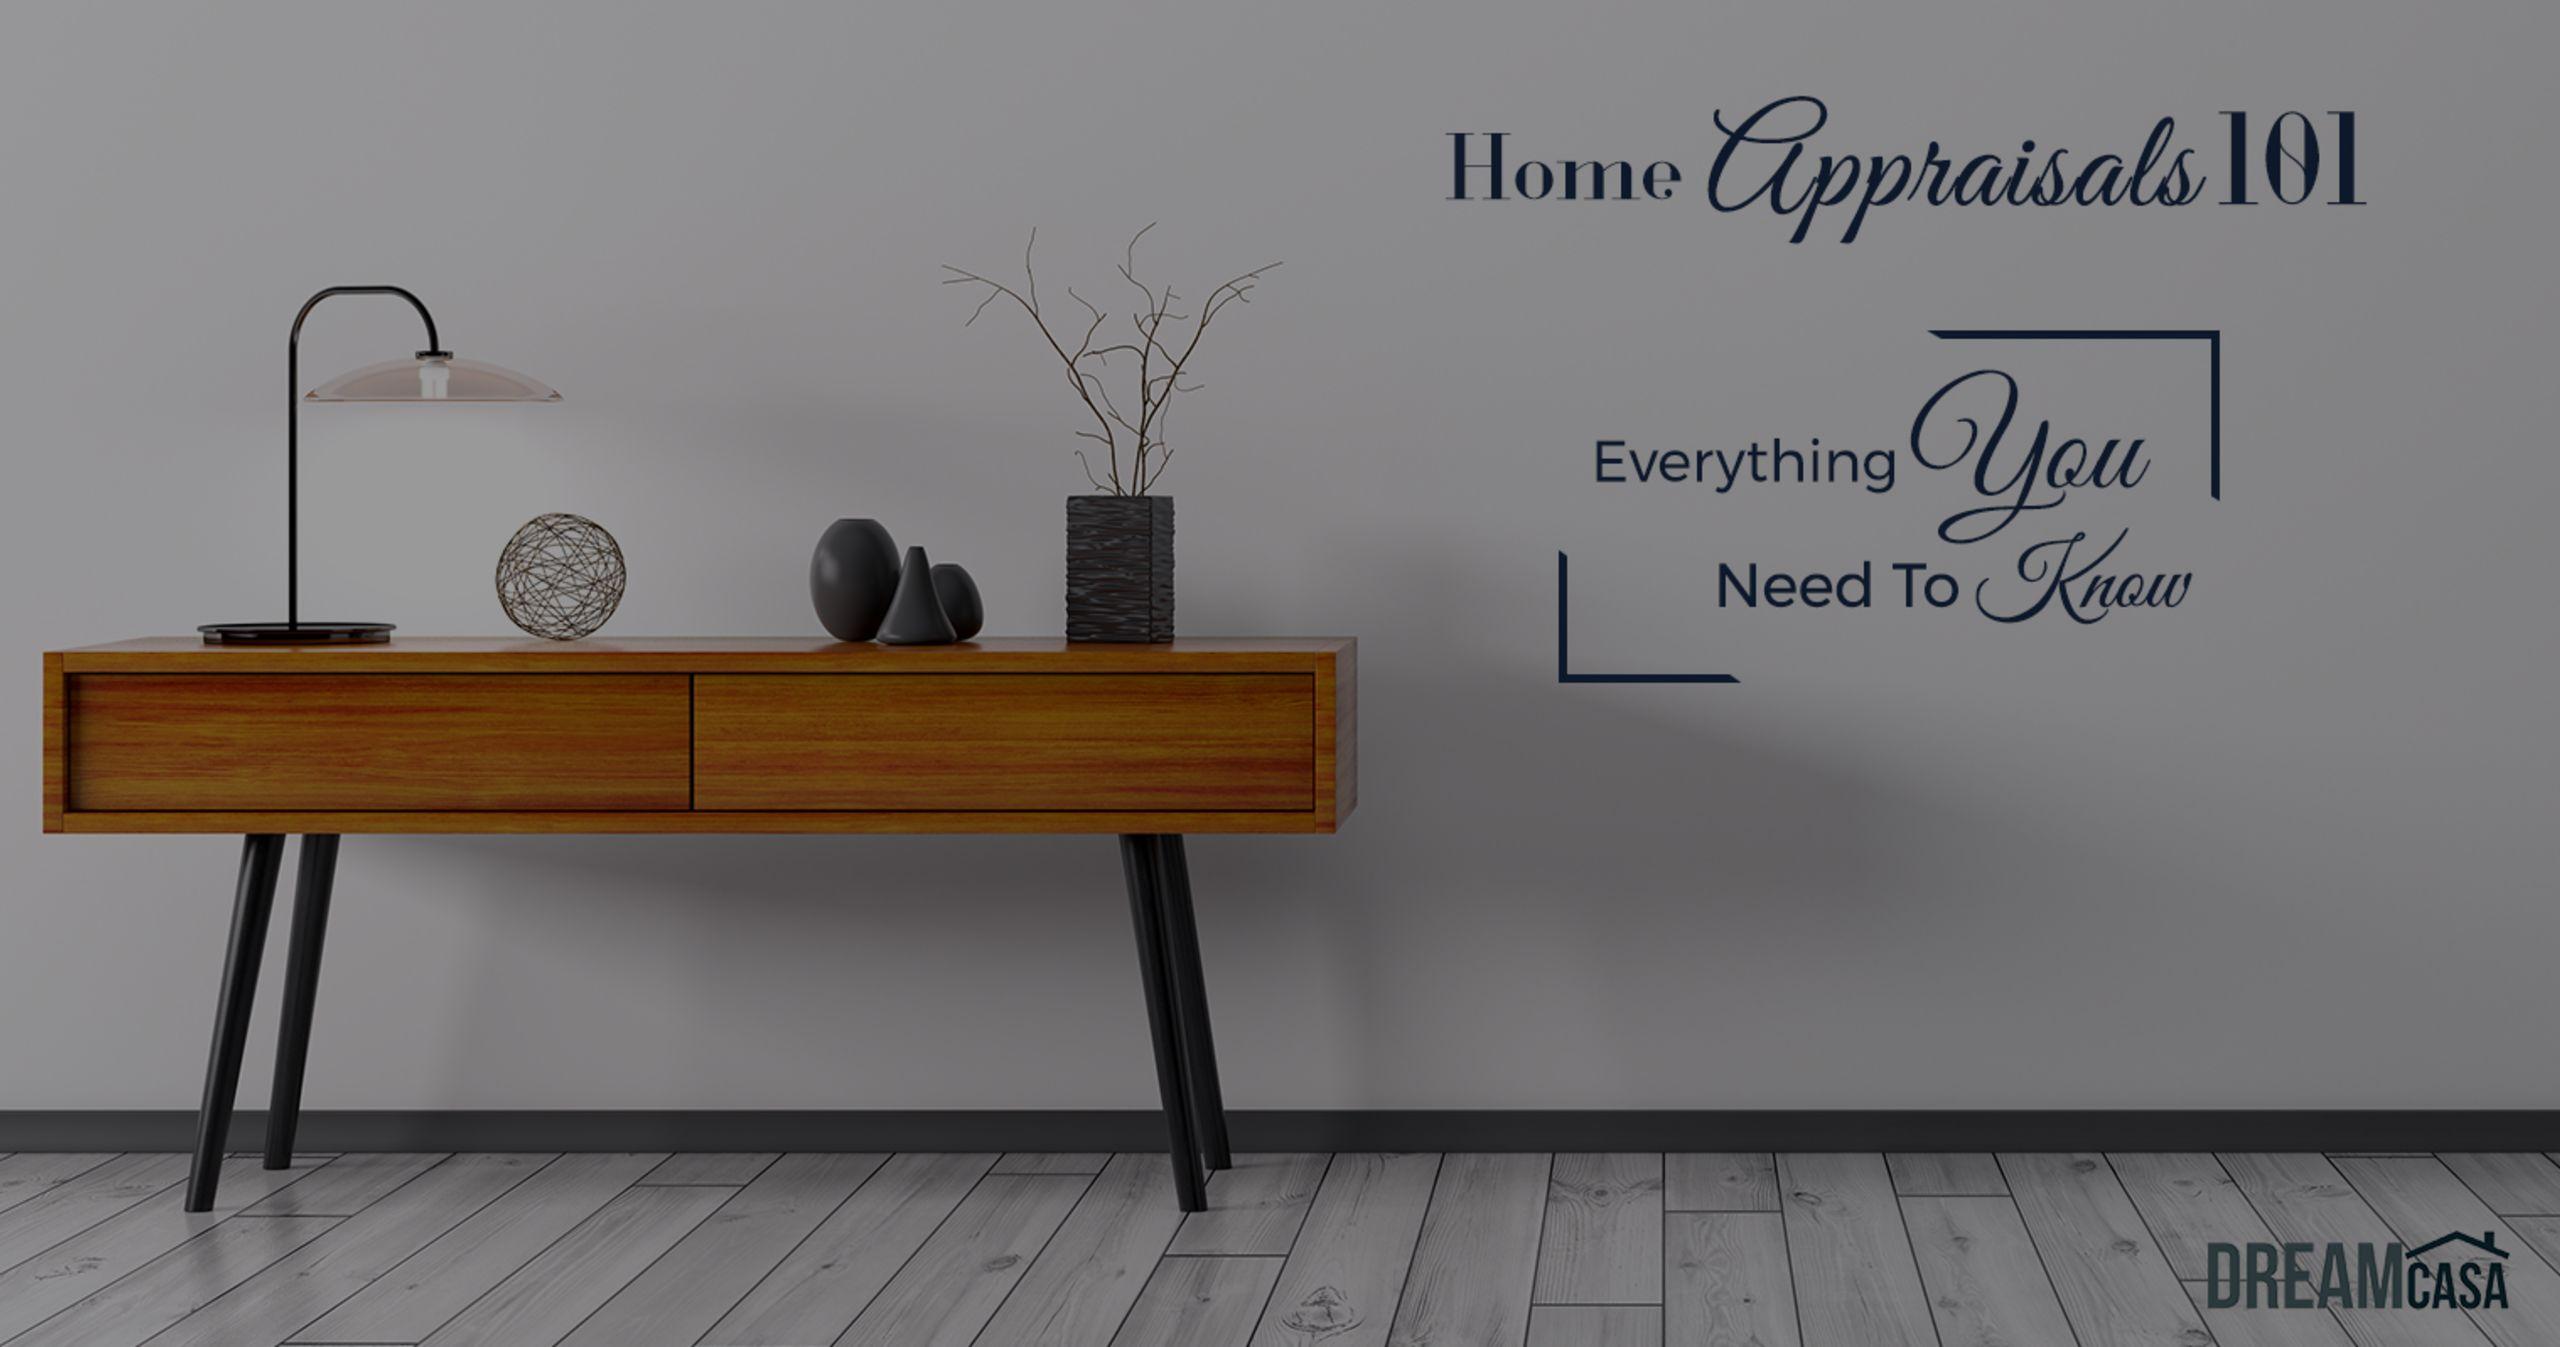 Home Appraisals 101